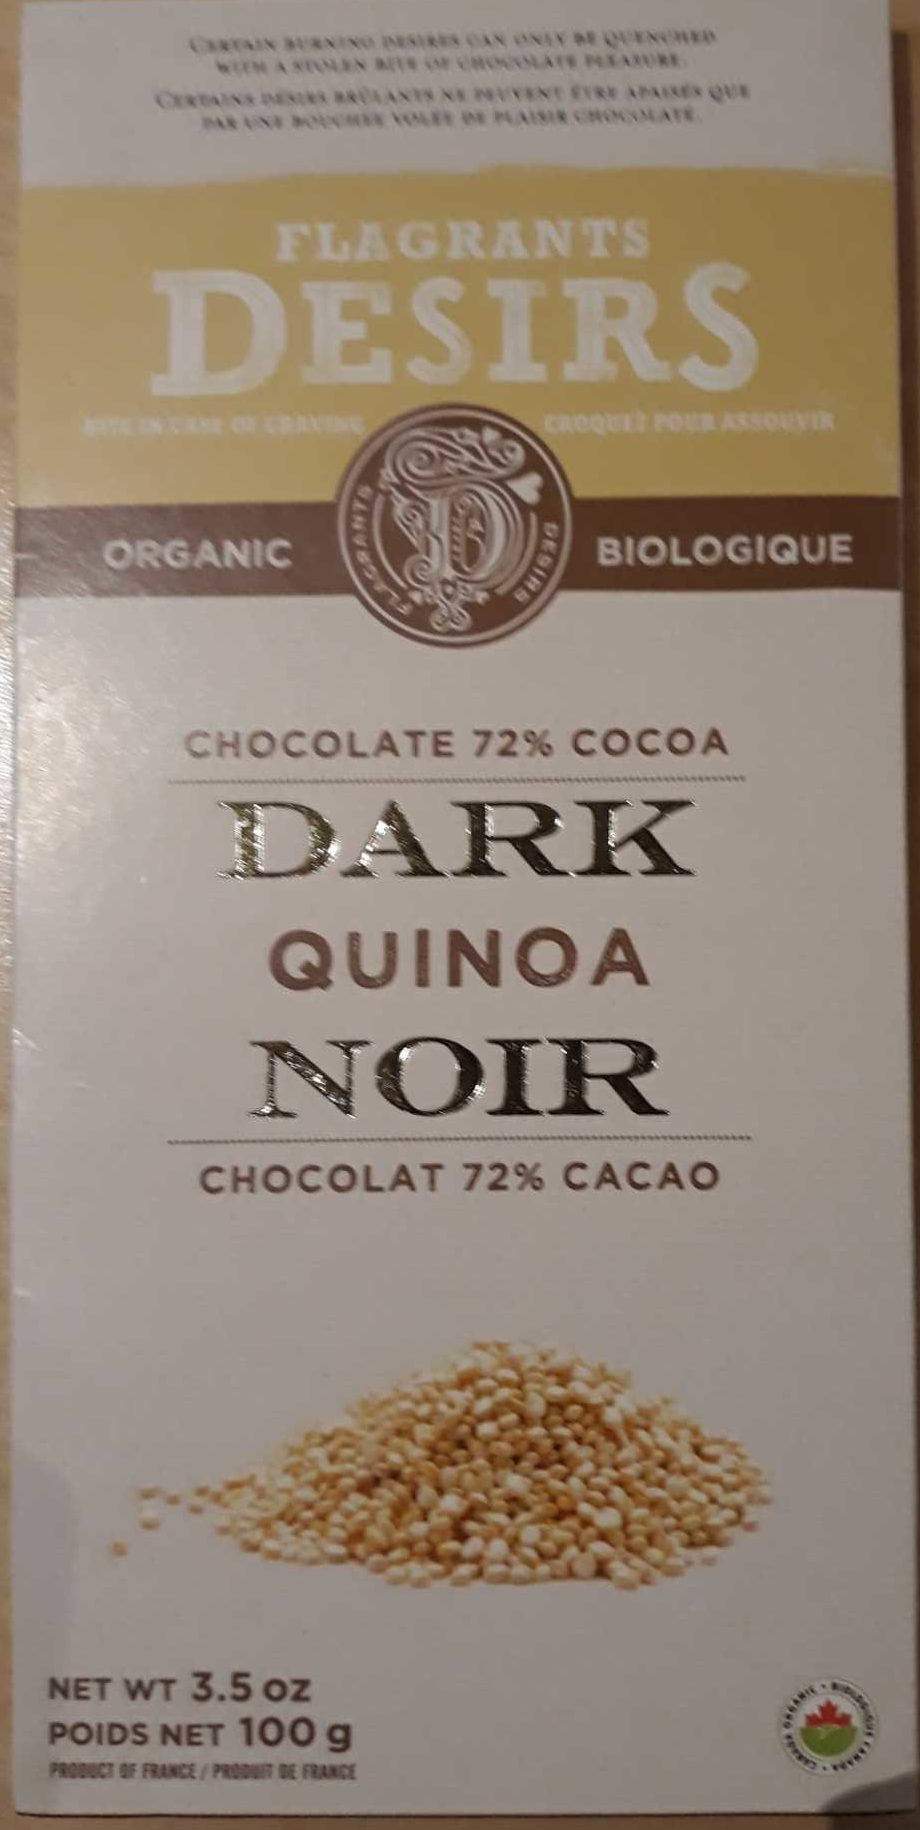 Quinoa noir - Product